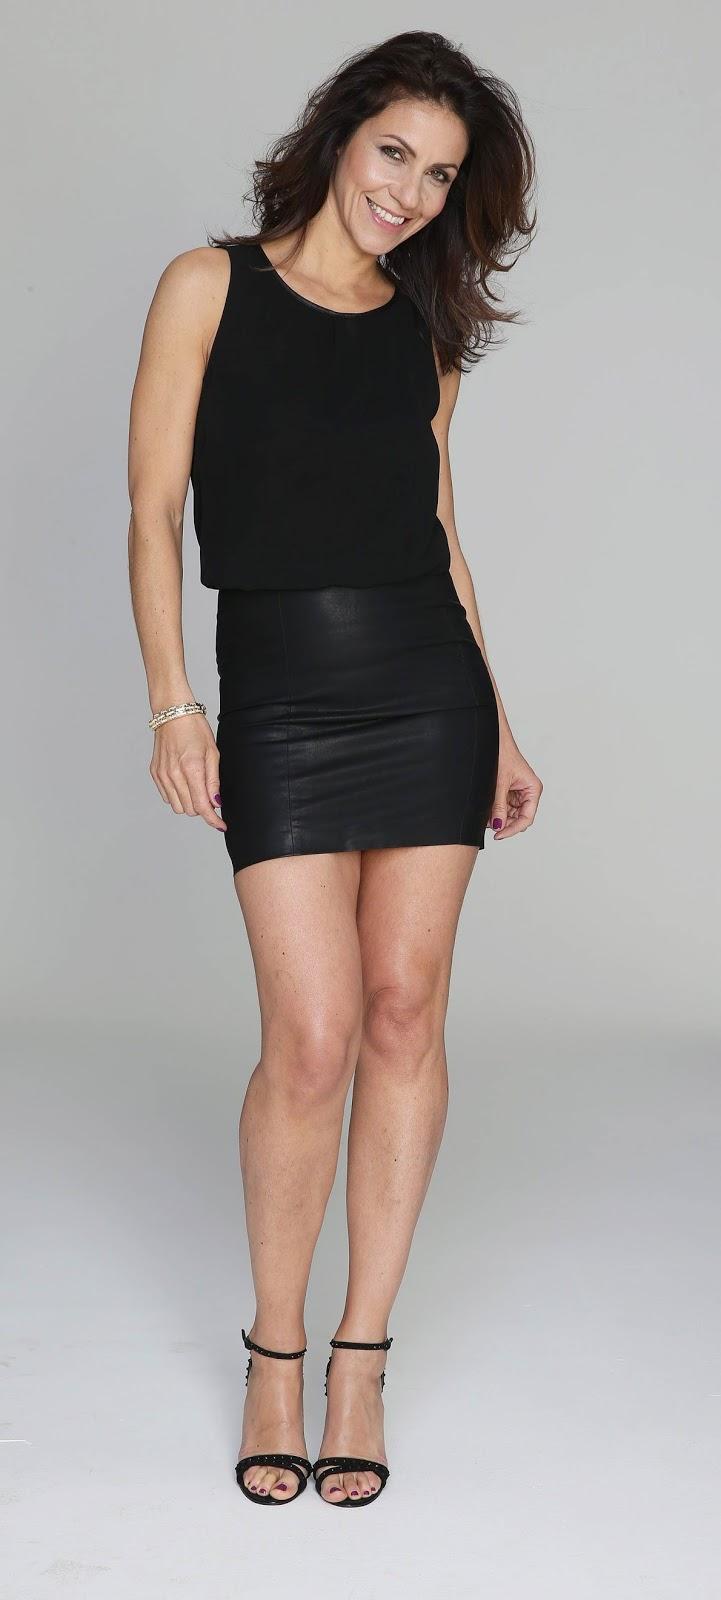 Lady in mini skirt